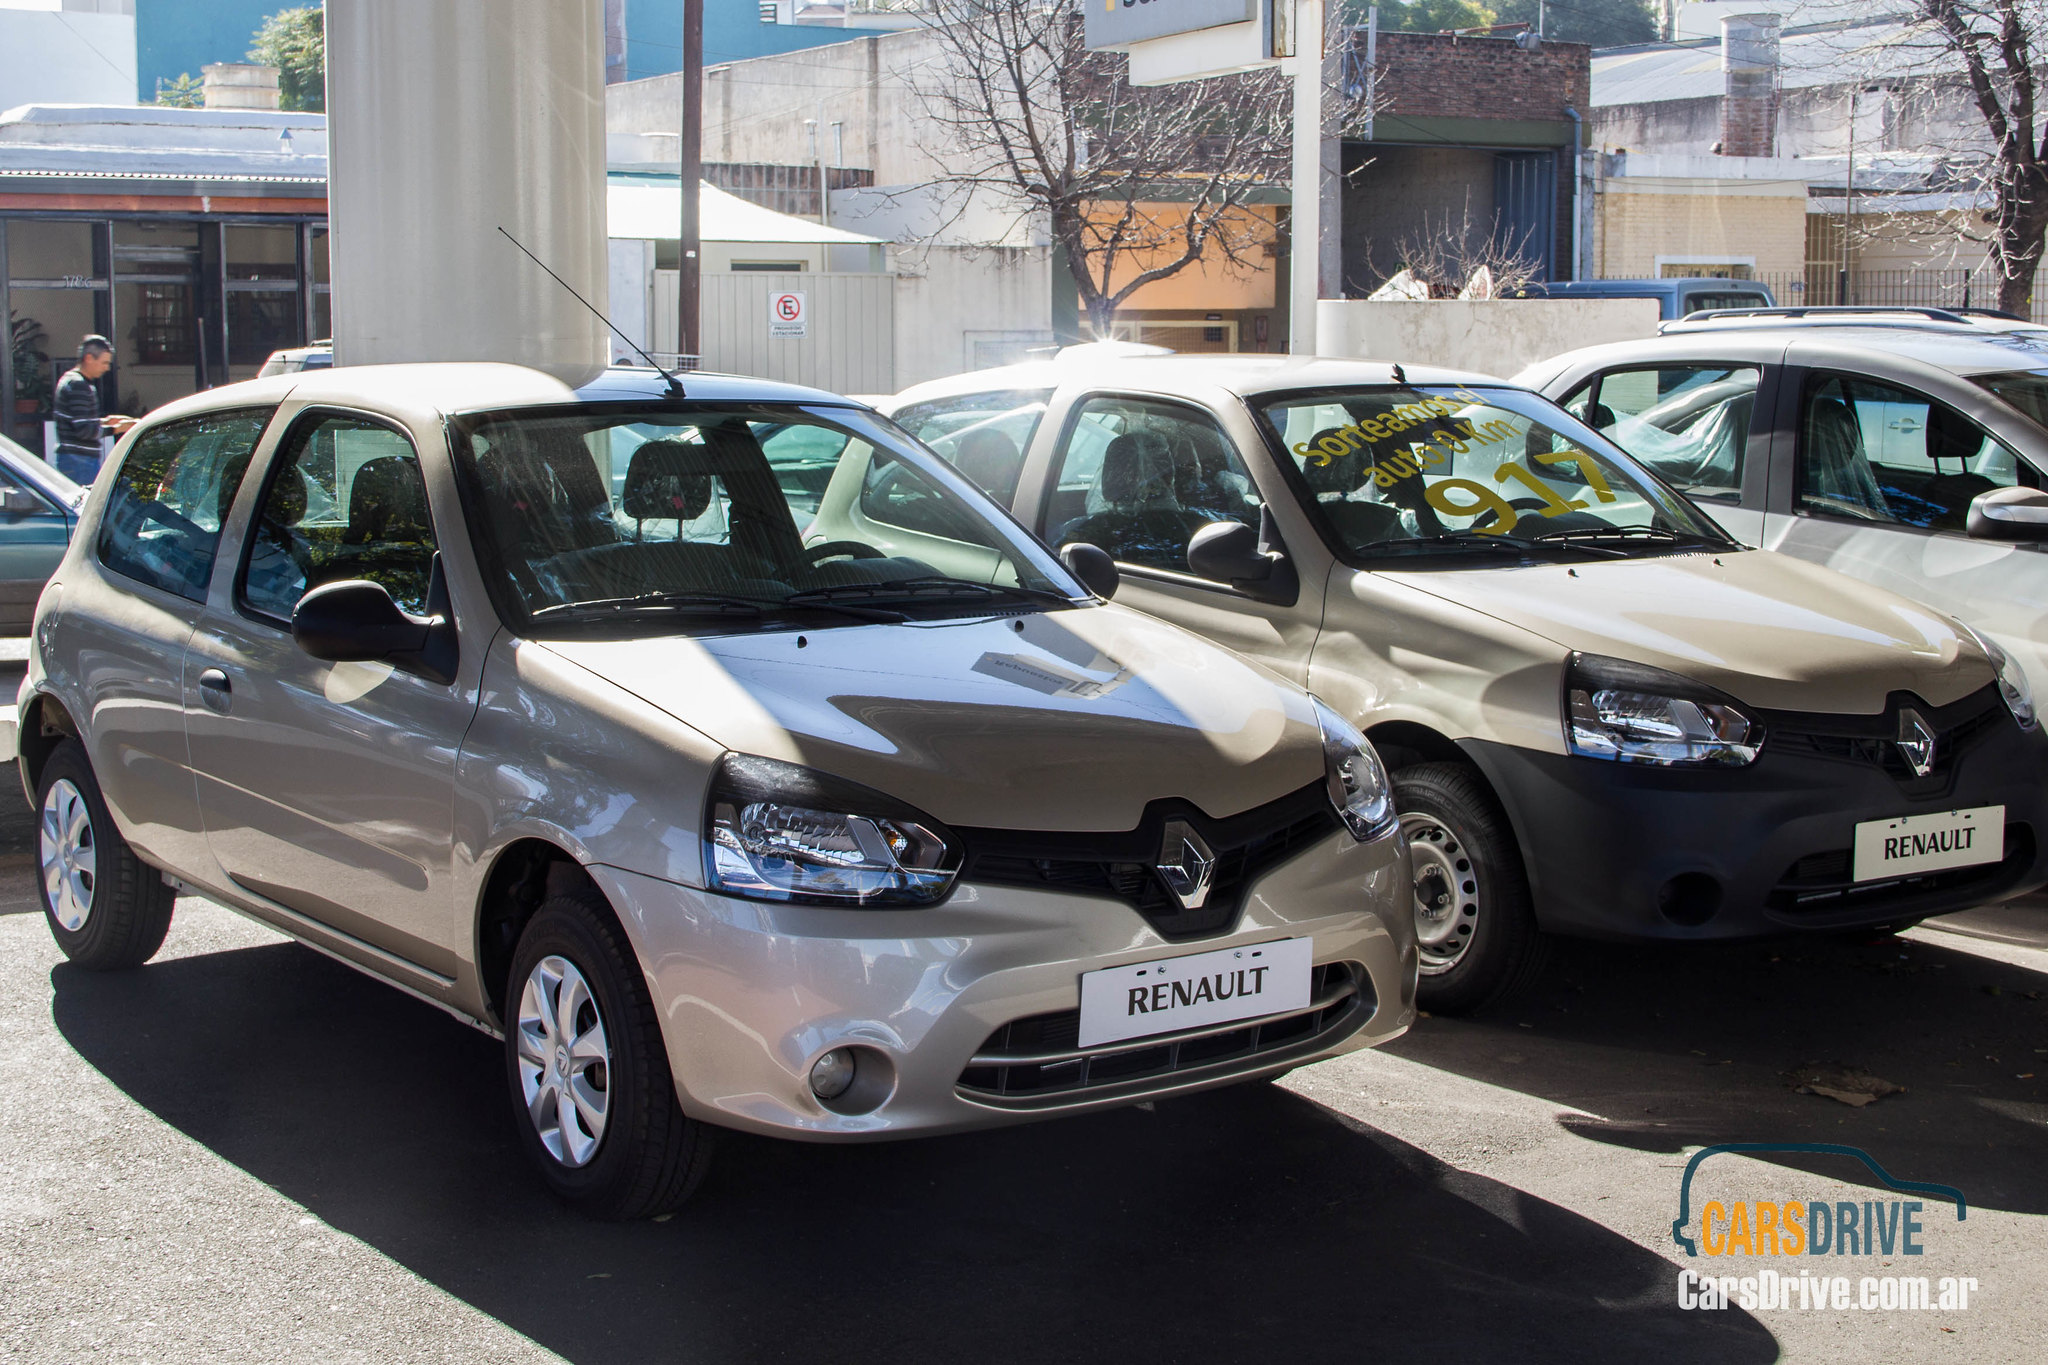 CarsDrive Córdoba ProCreAuto II  se lanzó la fase dos con otros ... 01b730a2ce7